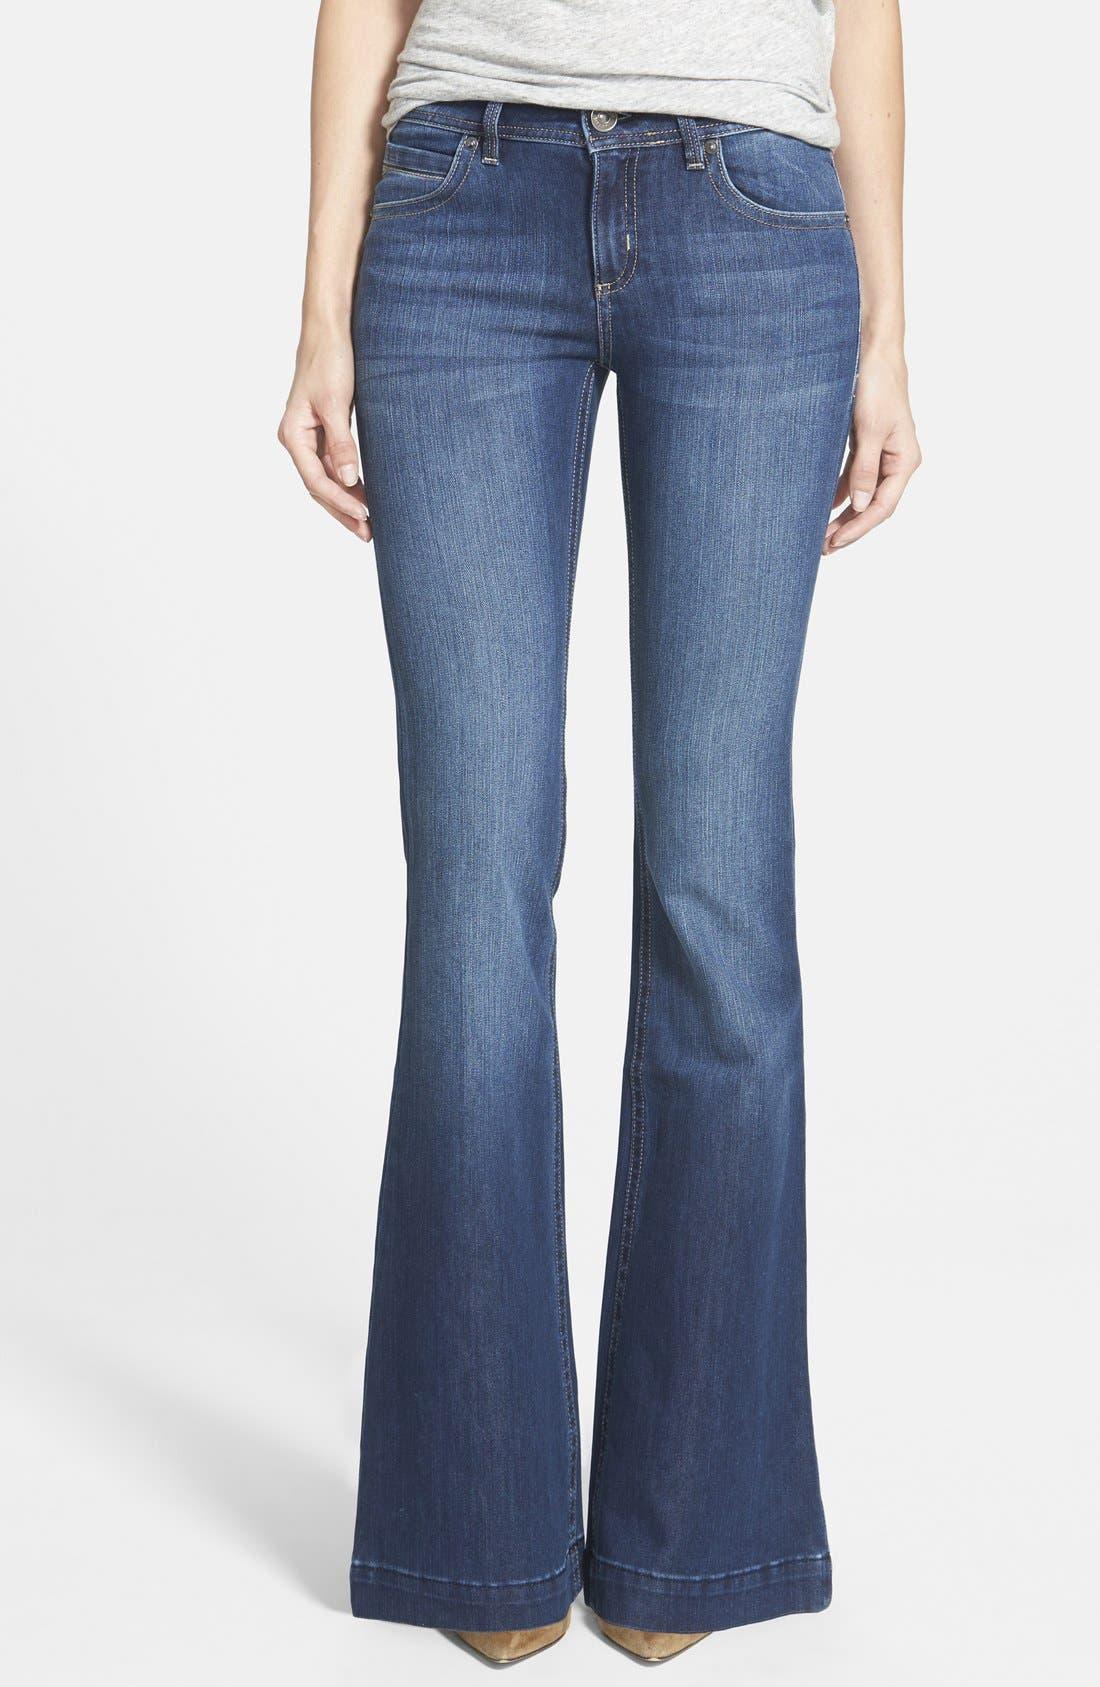 'Joy' Flare Jeans,                             Main thumbnail 1, color,                             425